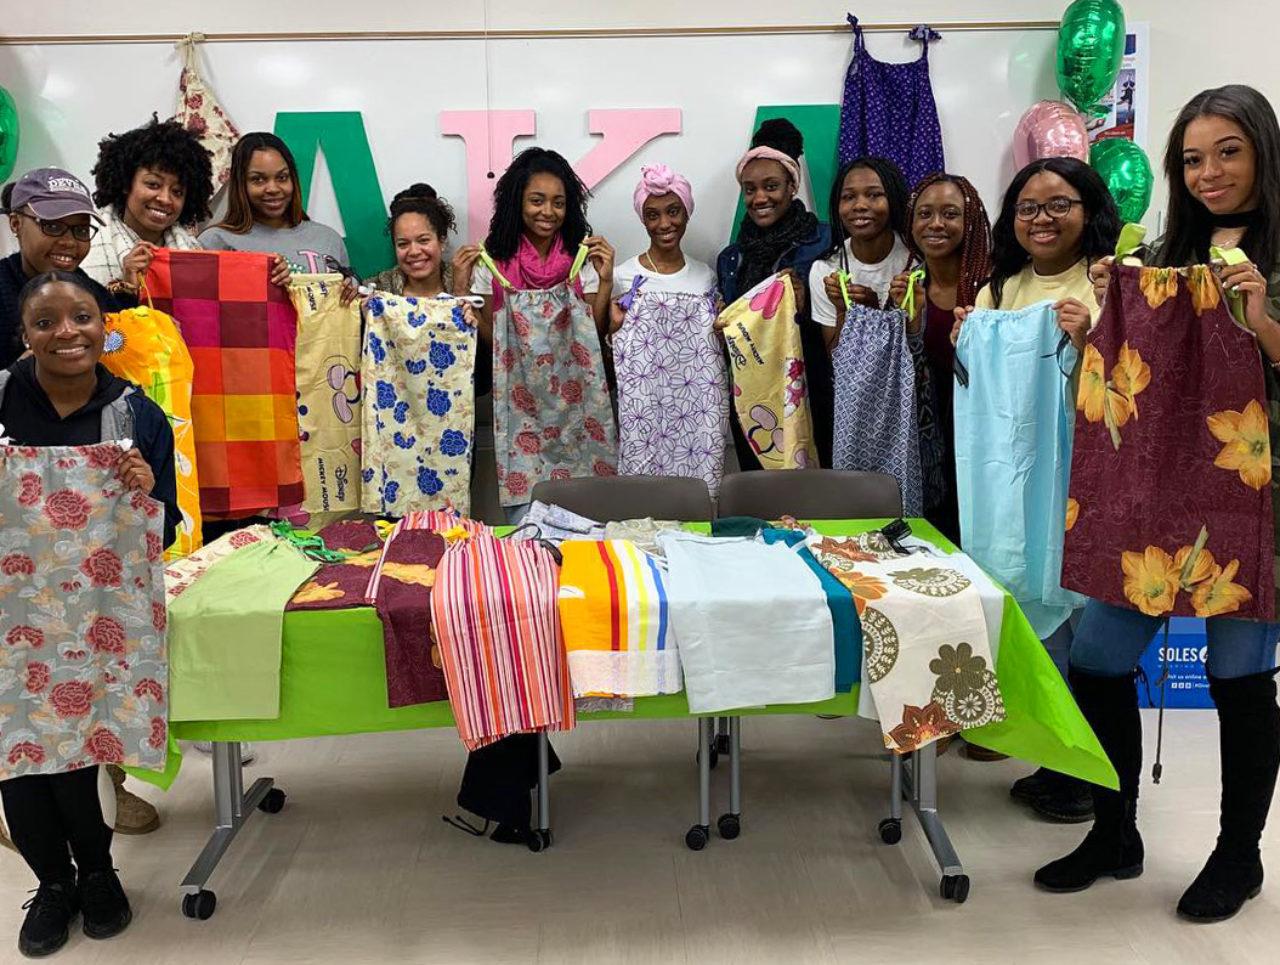 Alpha Kappa Alpha Sorority sewed dresses for girls in Haiti